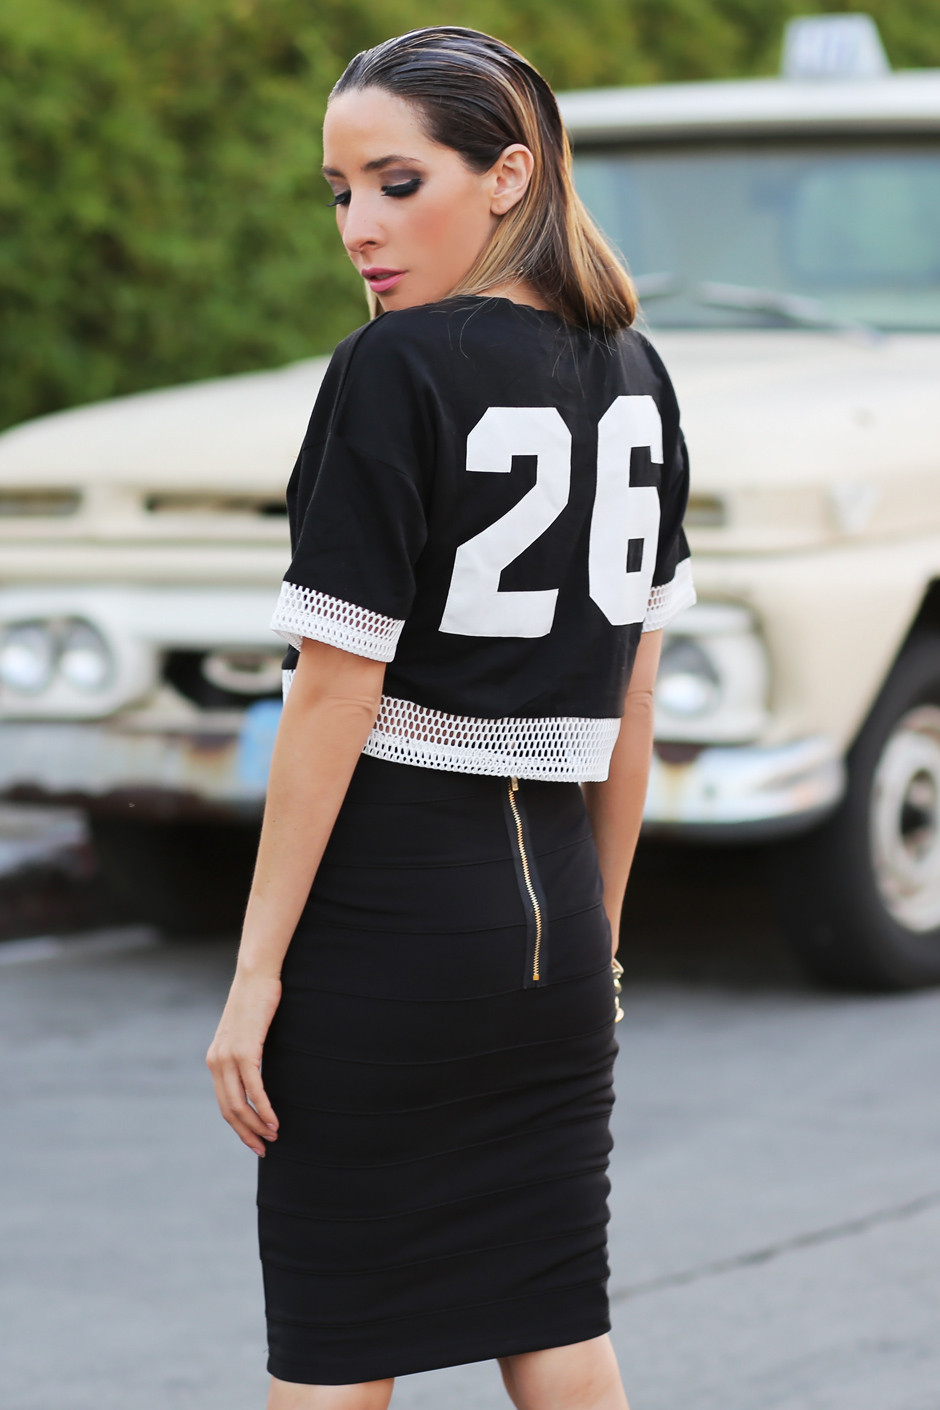 #26 MESH TRIMMED CROP TOP | Haute & Rebellious